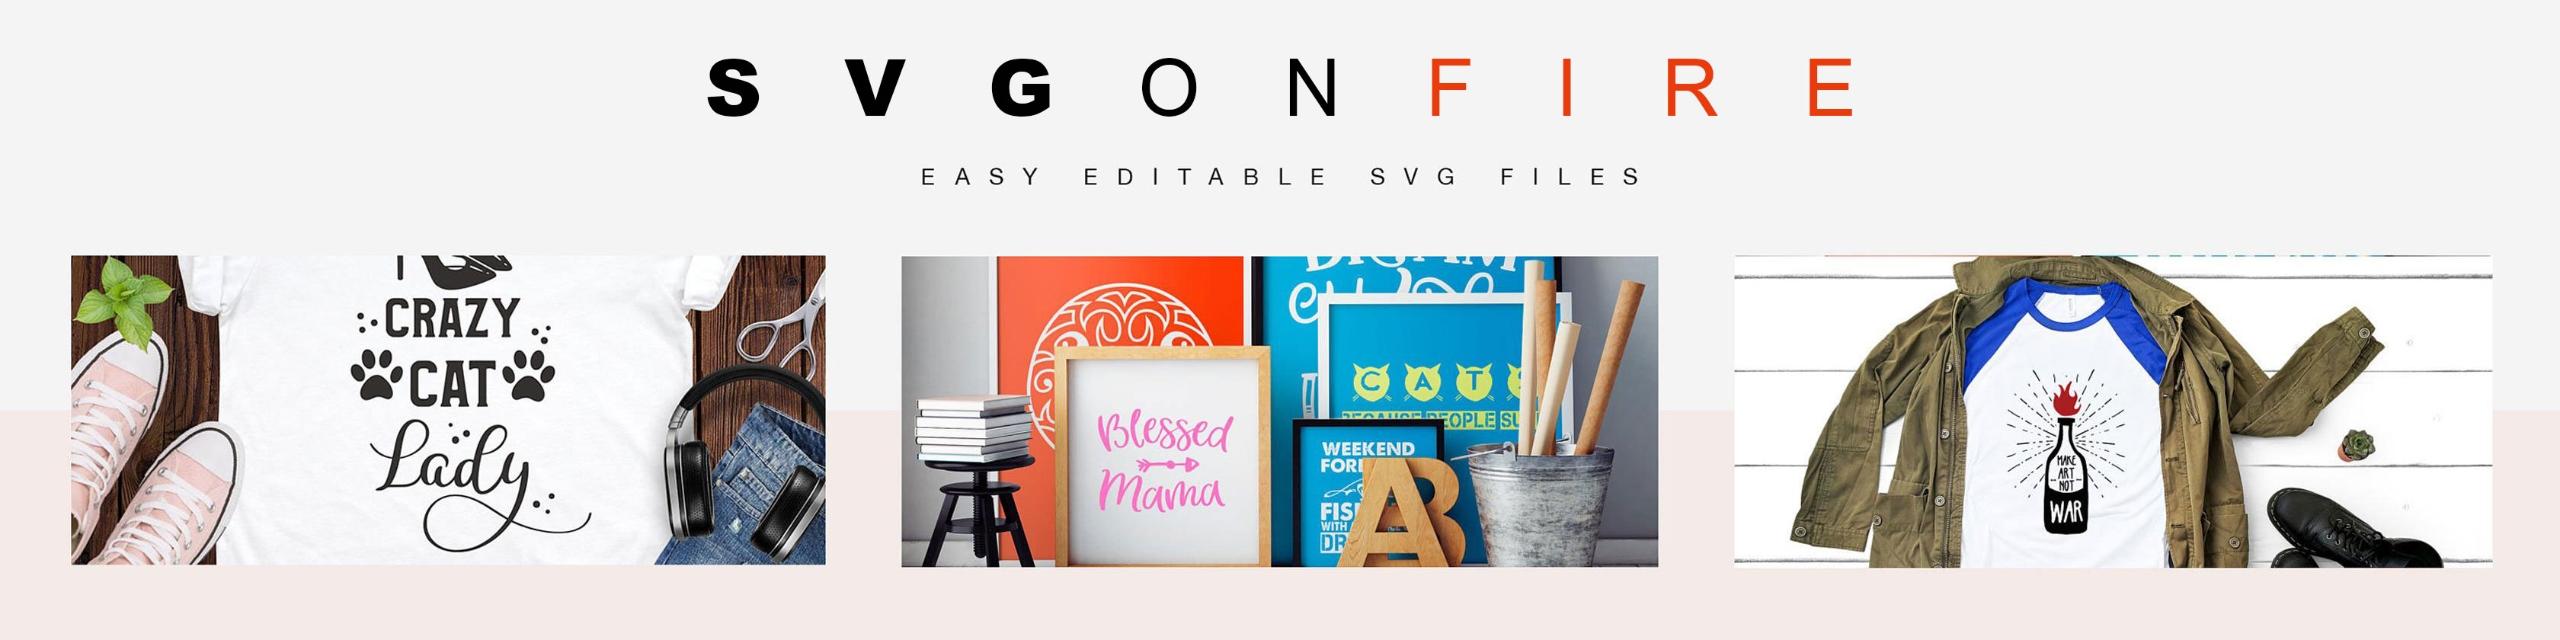 SVGOnFire (@svgonfire) Cover Image